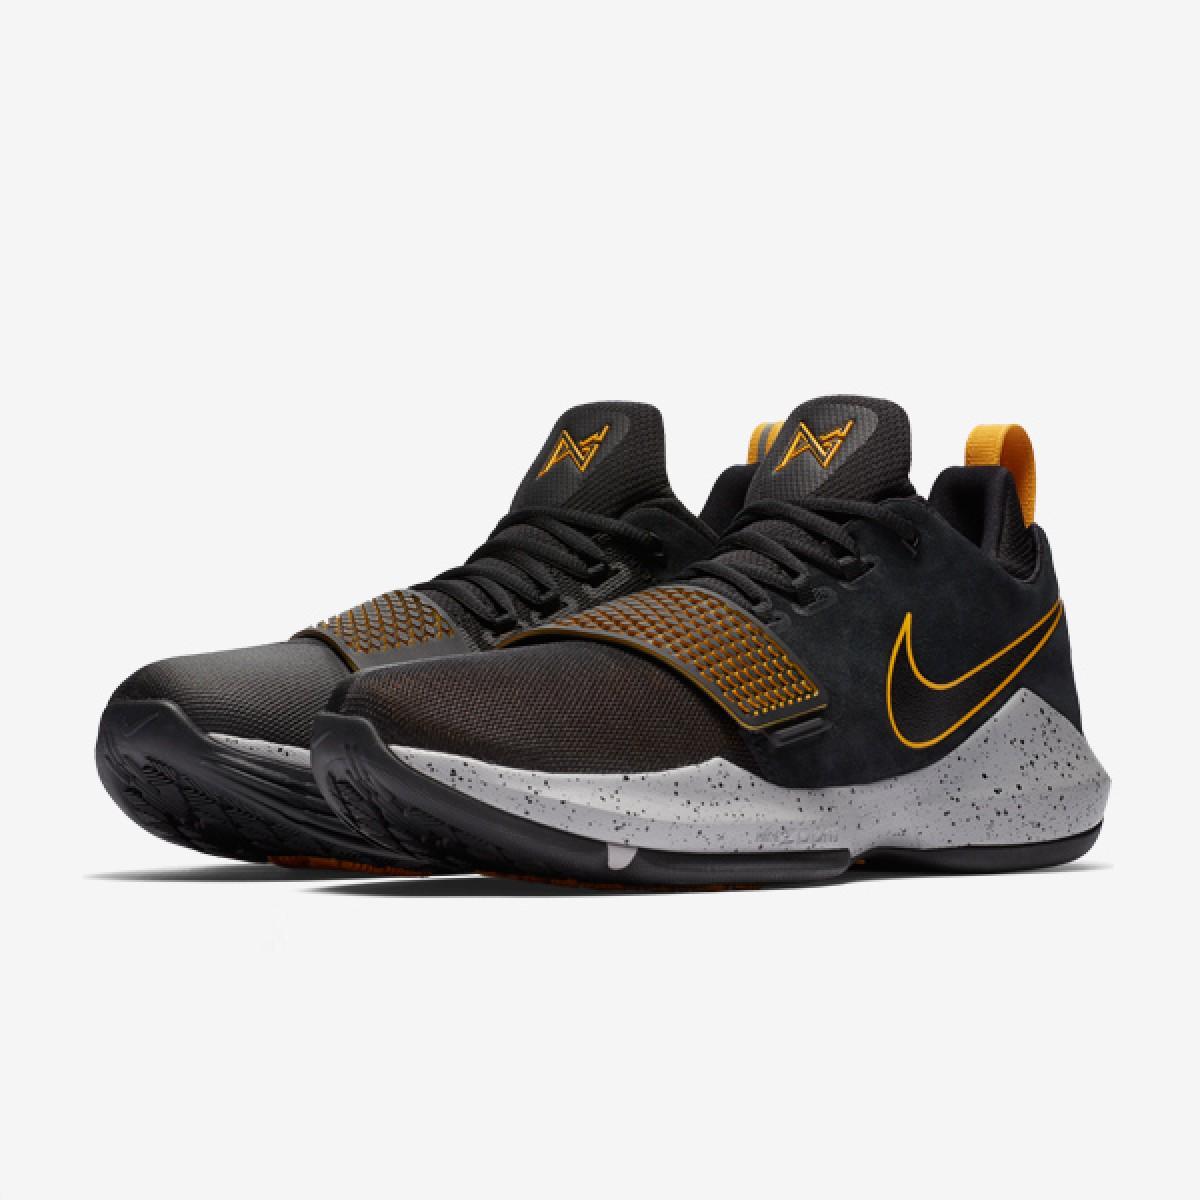 Nike PG1 'Black Gold' 878627-006